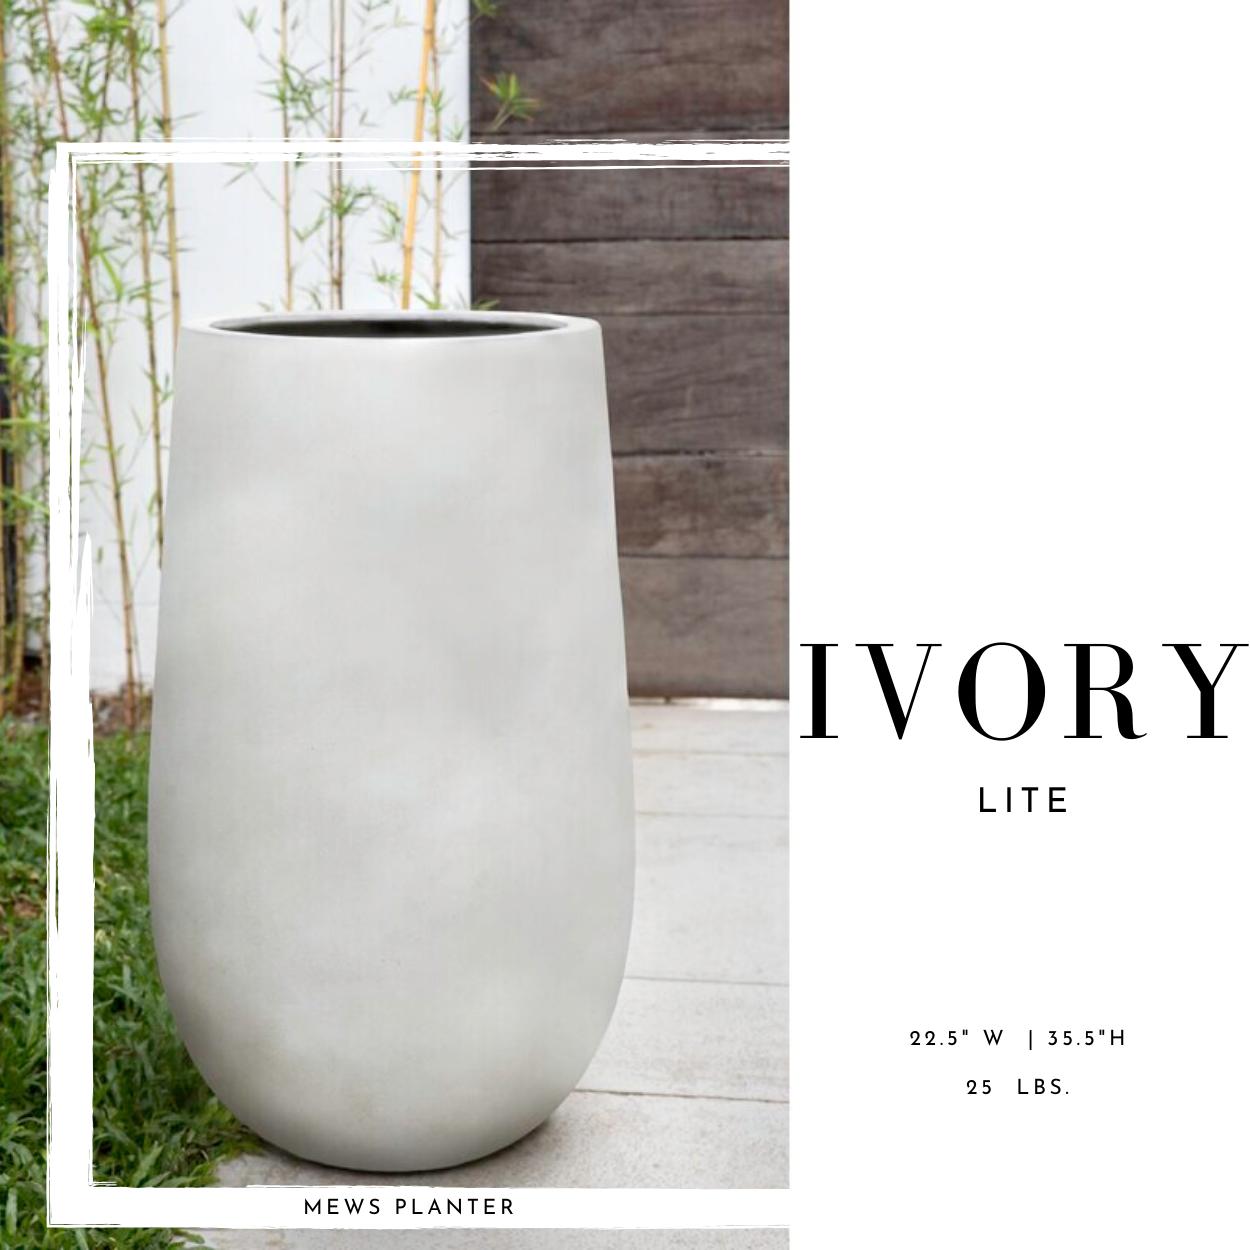 ivory-lite-campania-international-planter